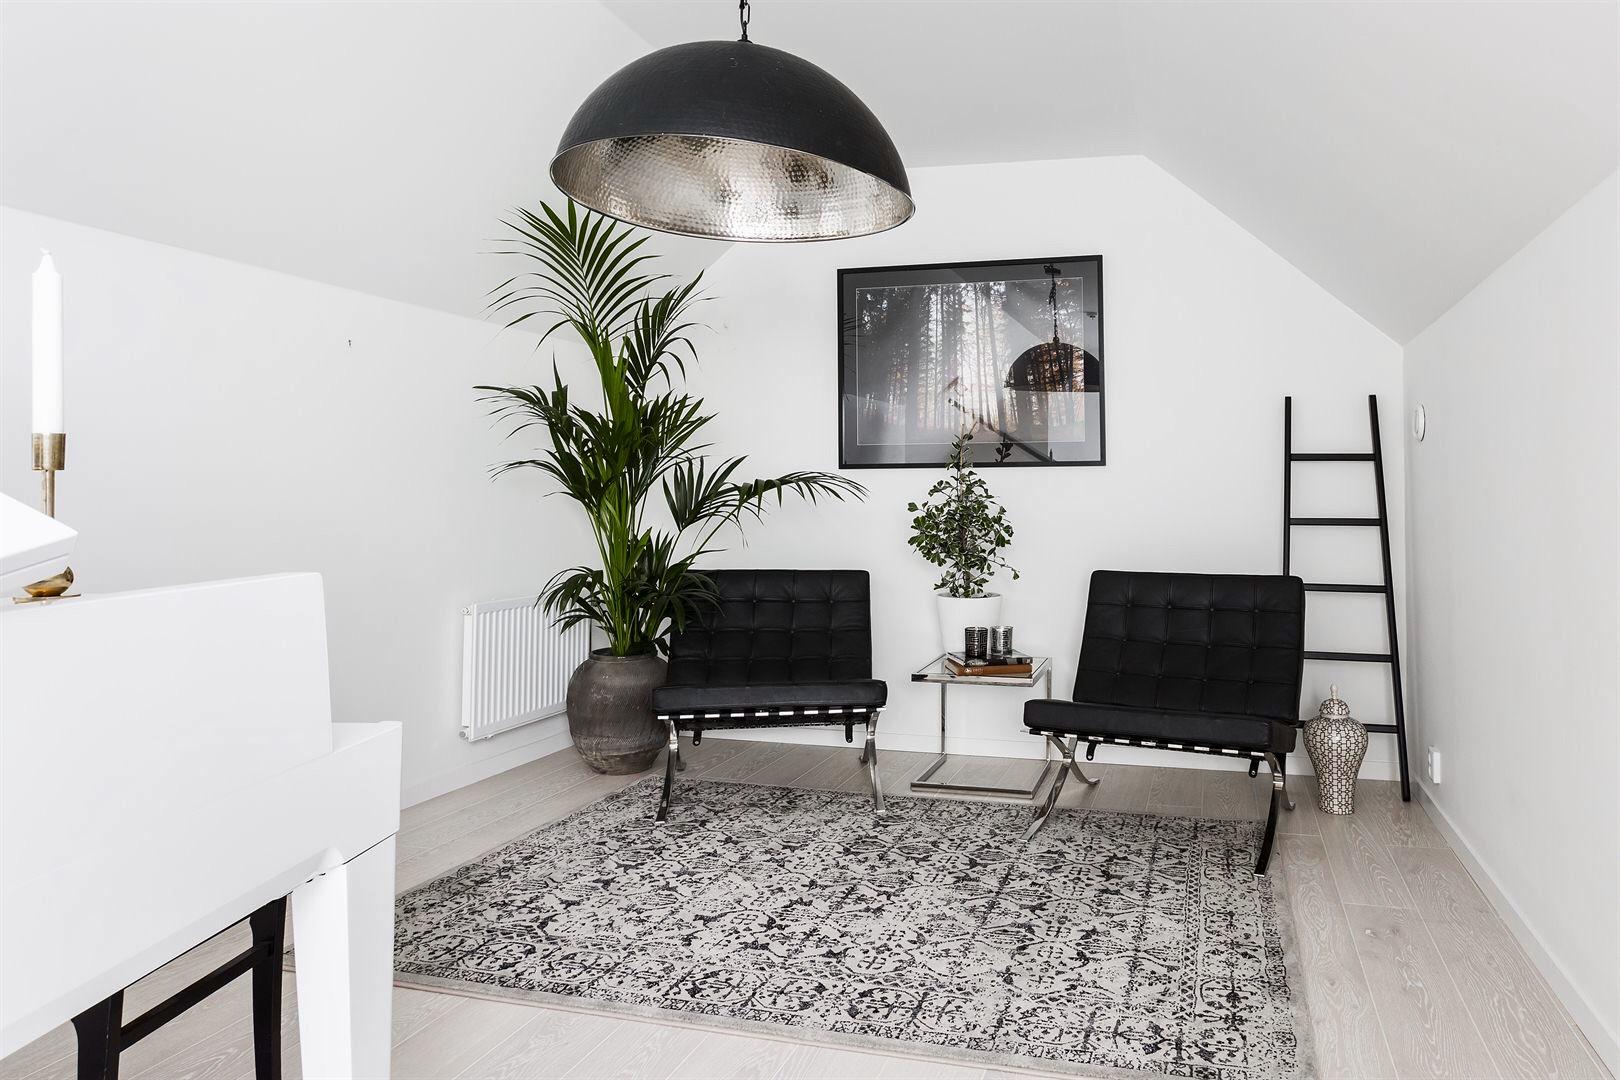 комната антресоли рояль кресла ковер лесенка люстра